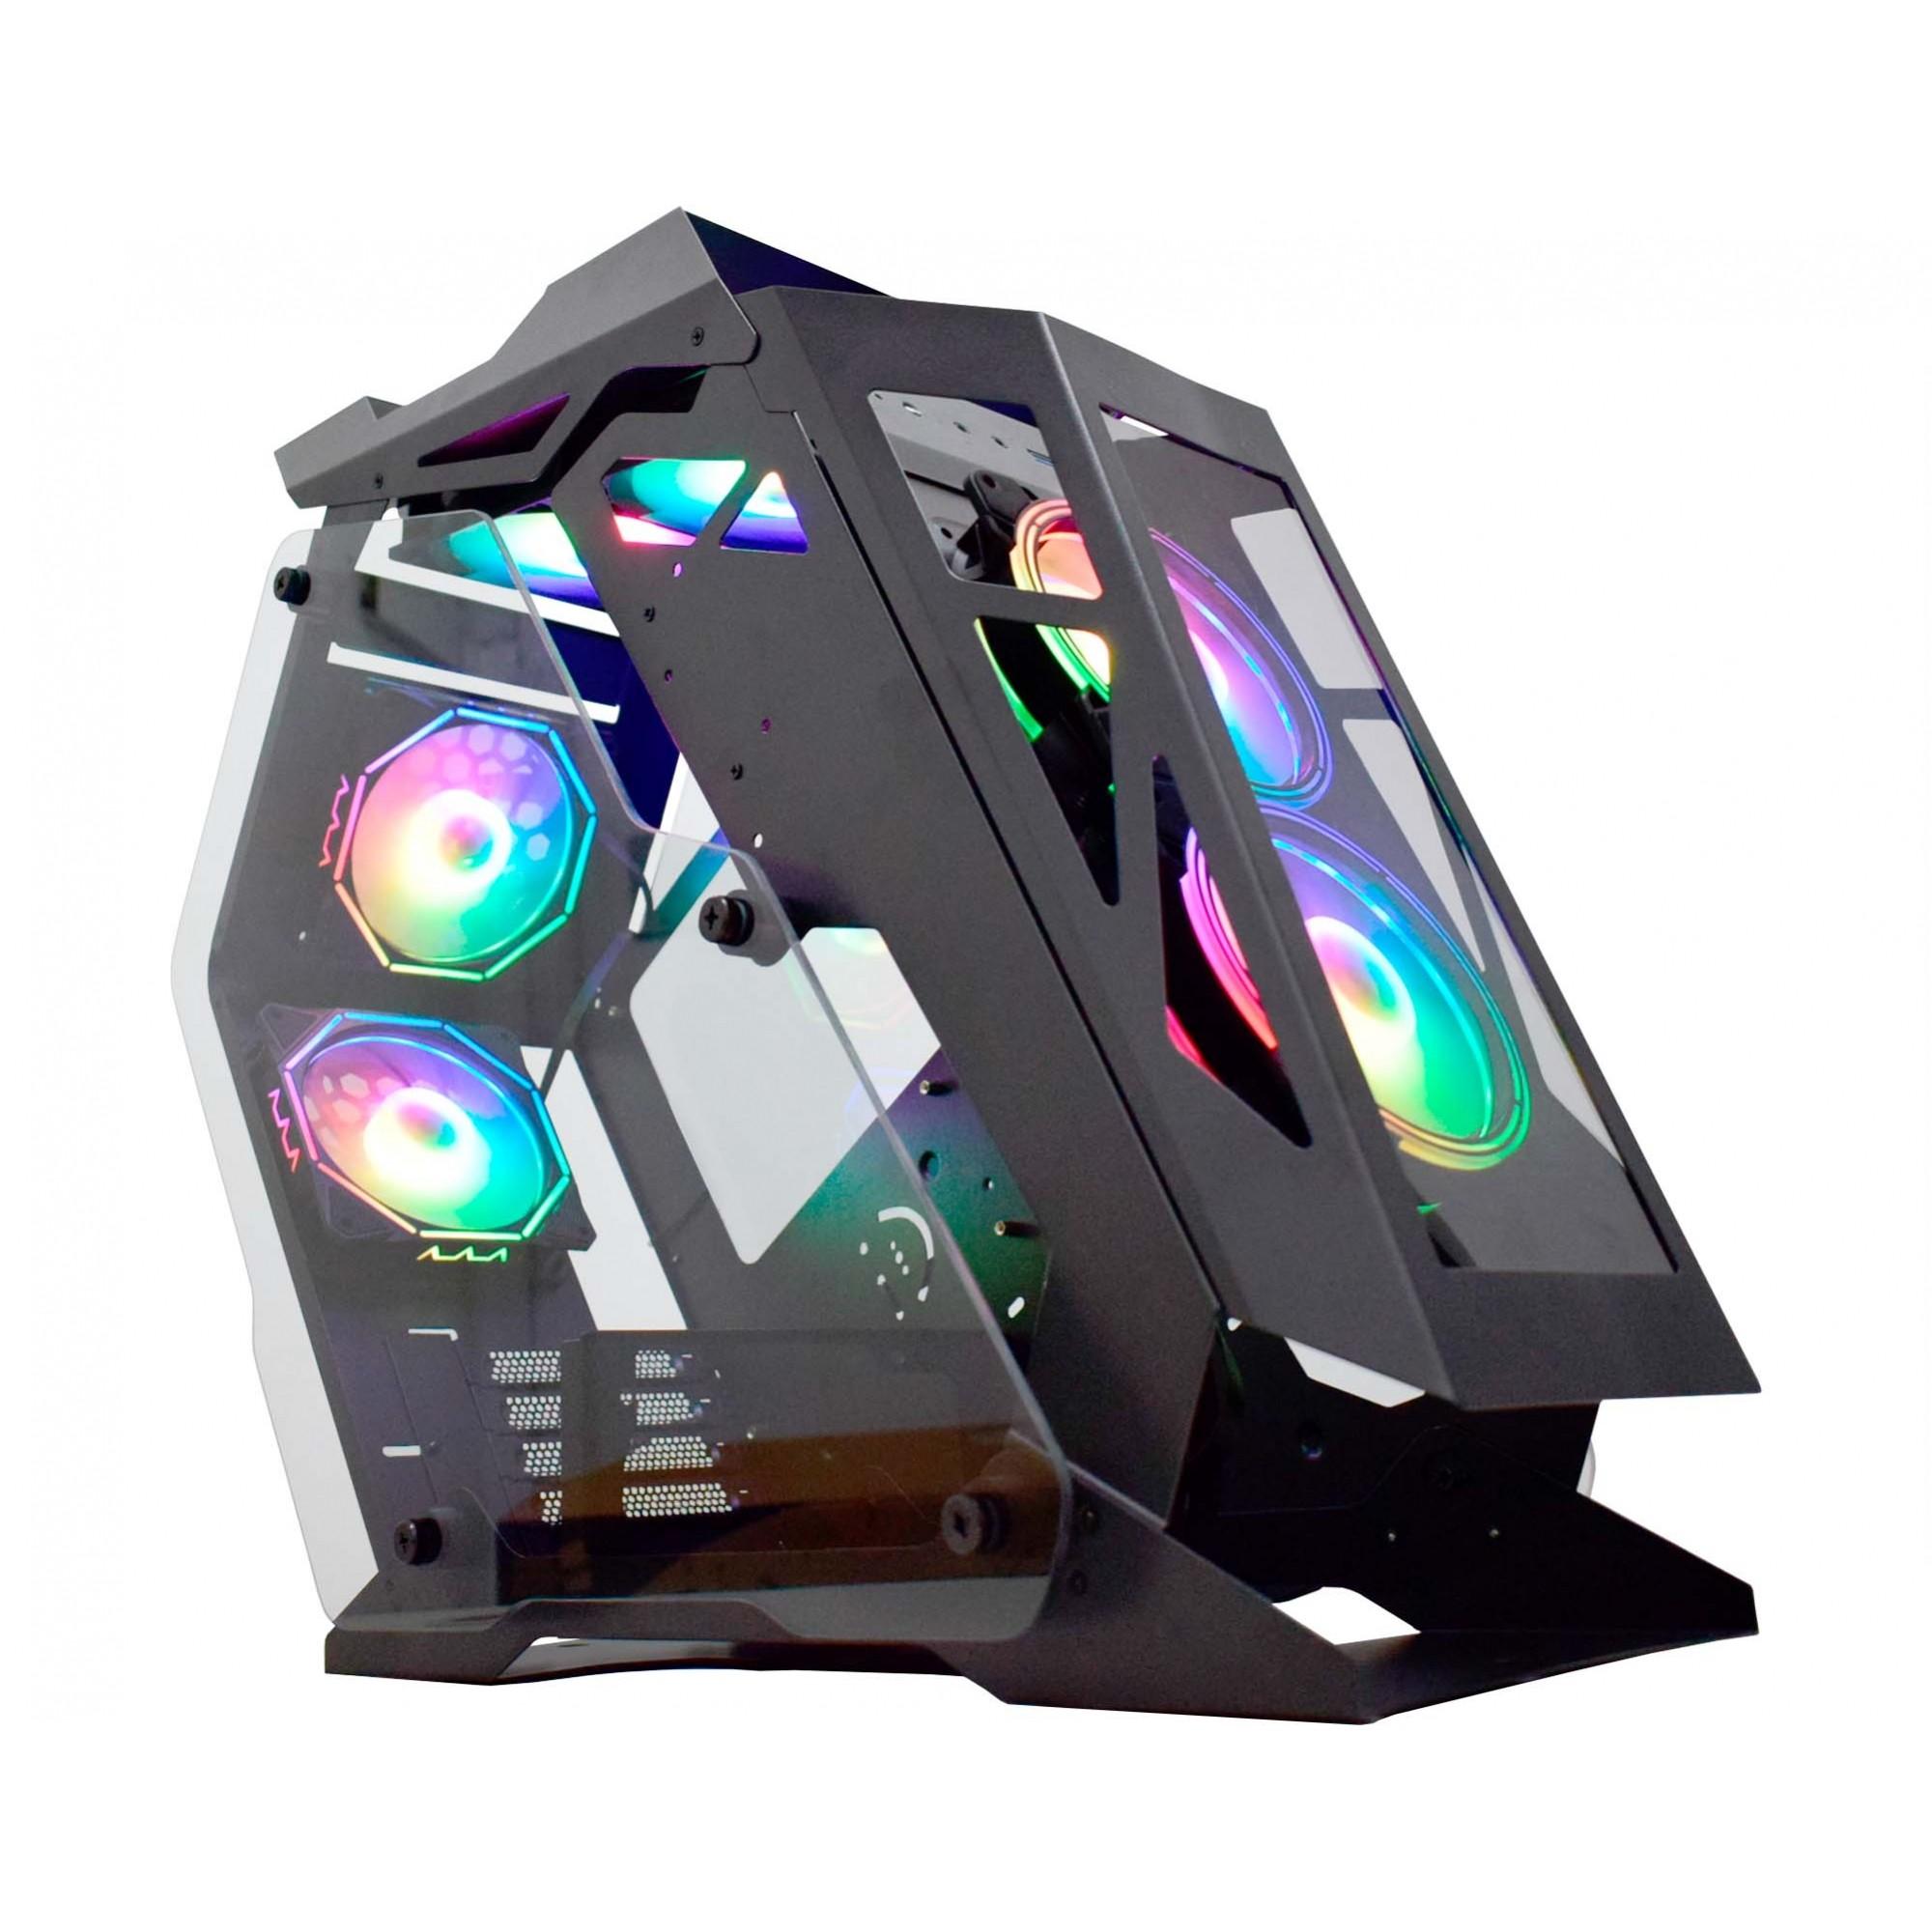 Gabinete Gamer Kmex Micro Ranger Vidro Temperado sem Fans CG01PQRH001